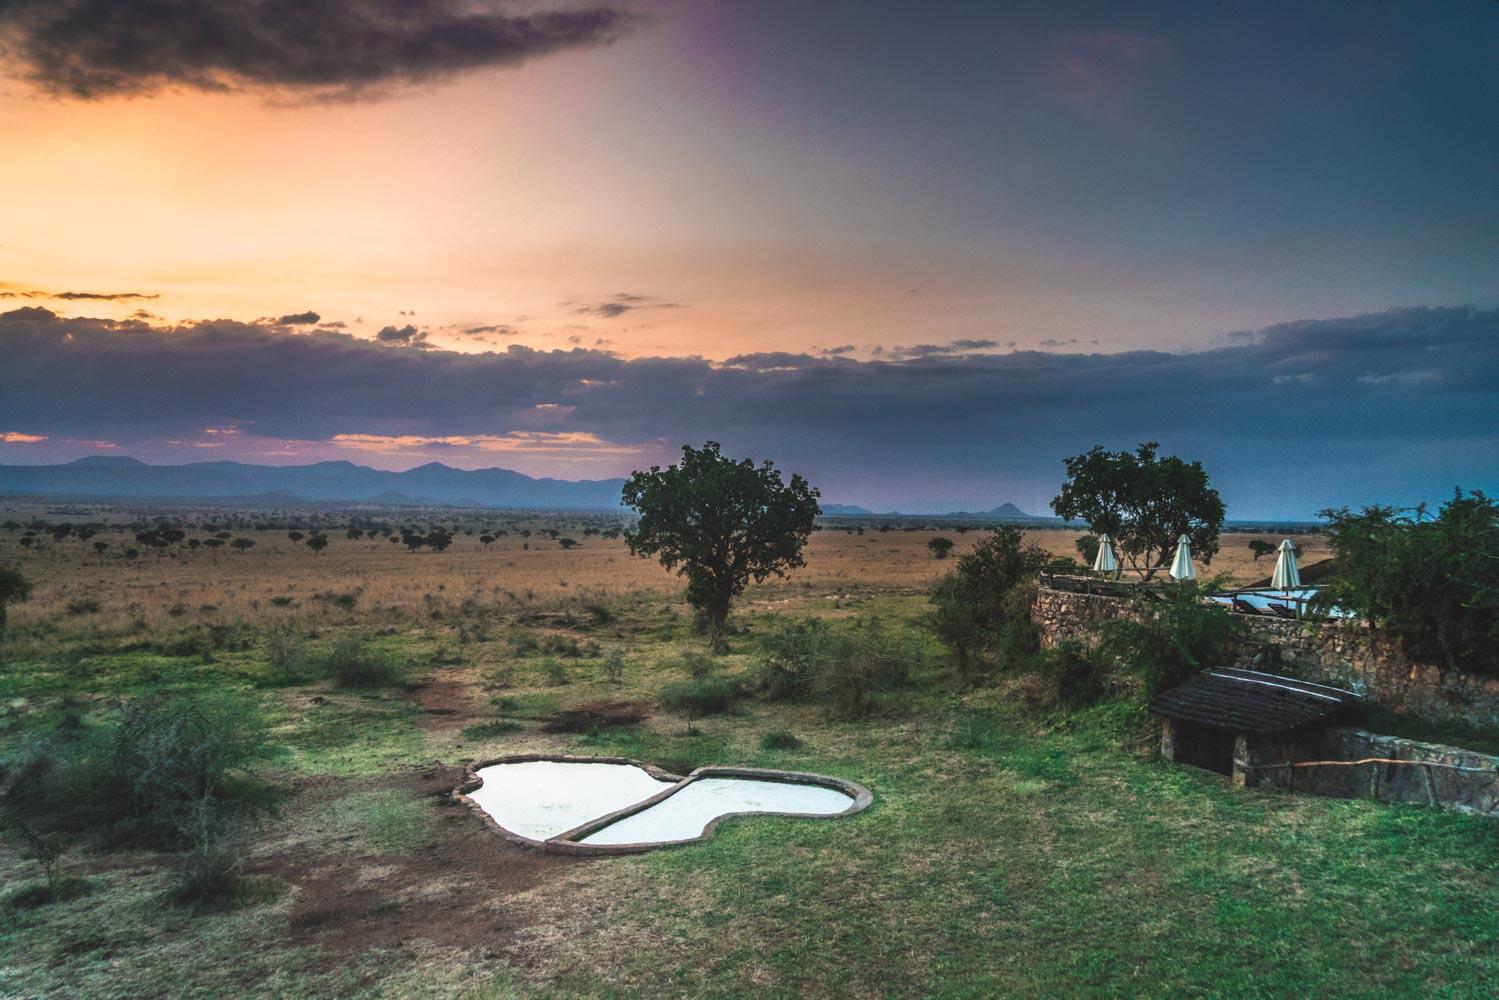 Watering hole at Apoka Safari Lodge in the Kidepo National Park